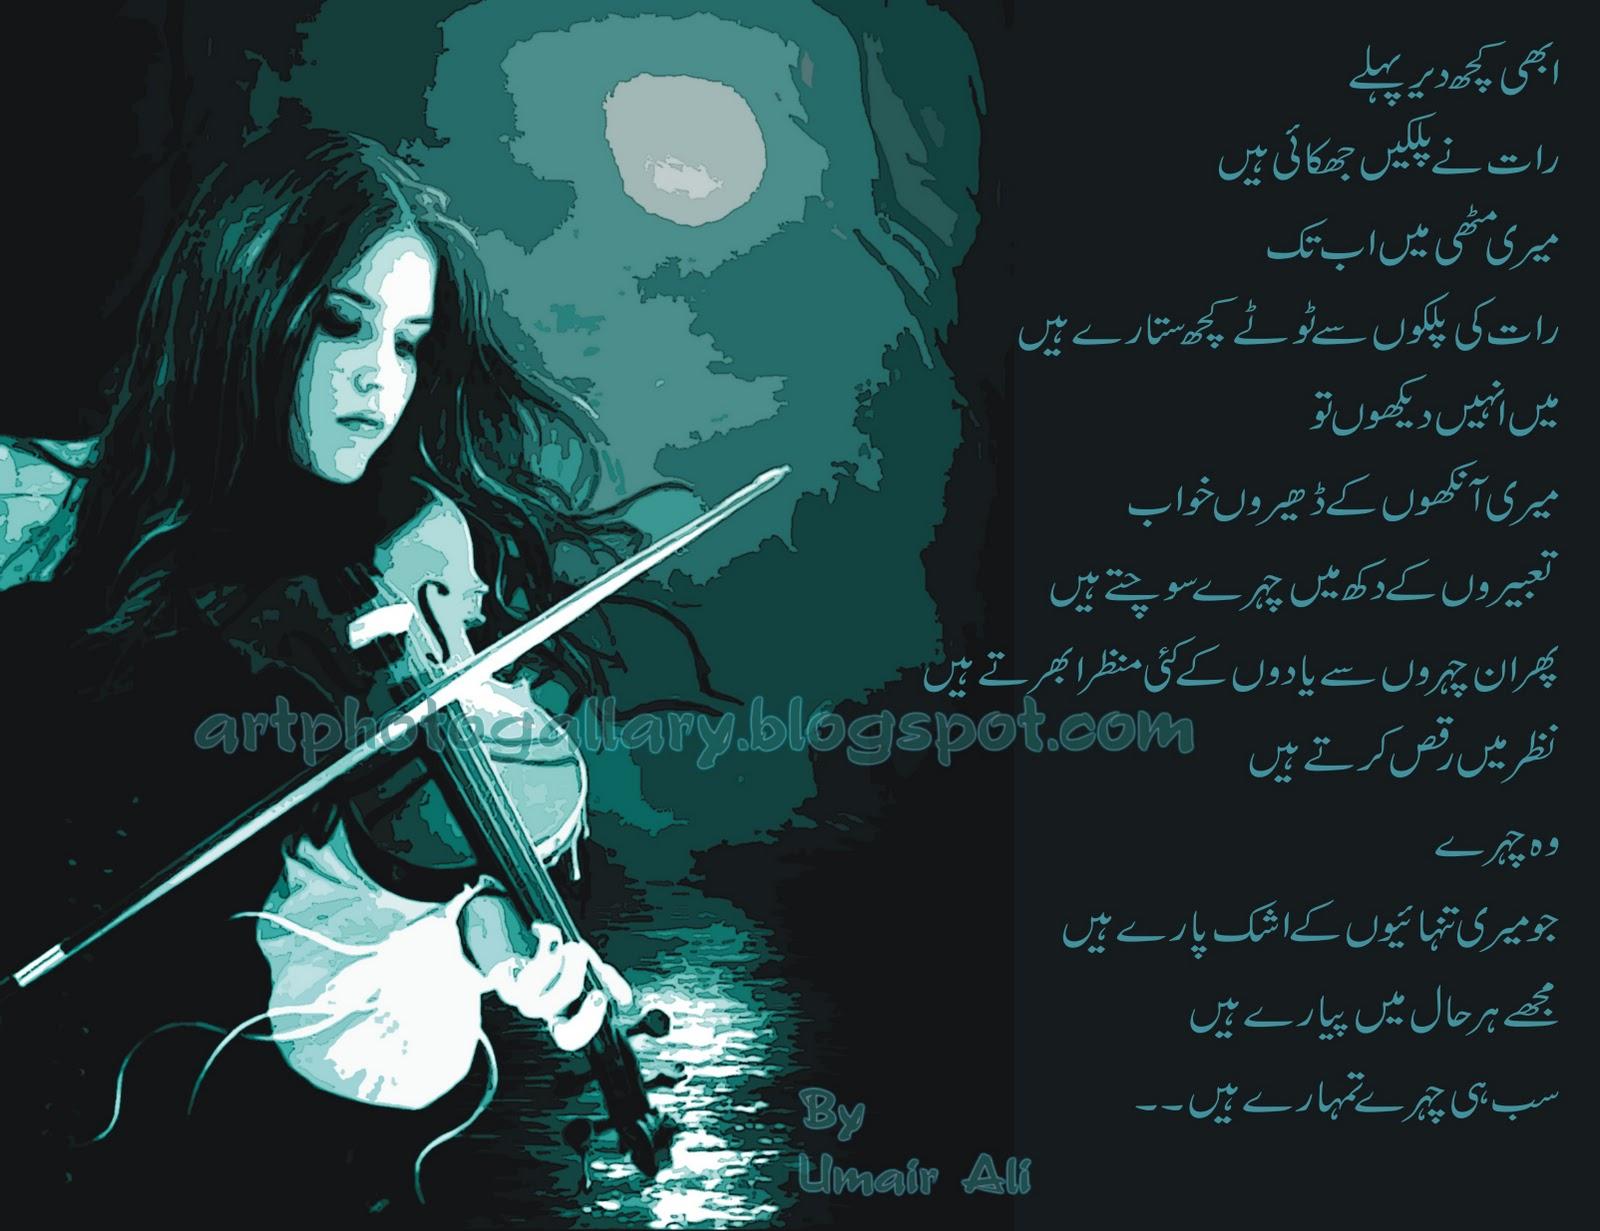 http://1.bp.blogspot.com/_X7LSwB5ybYw/TRxKMORqKOI/AAAAAAAAAaU/q_STavHL_8o/s1600/alone%2Bsad%2Bgirl.jpg